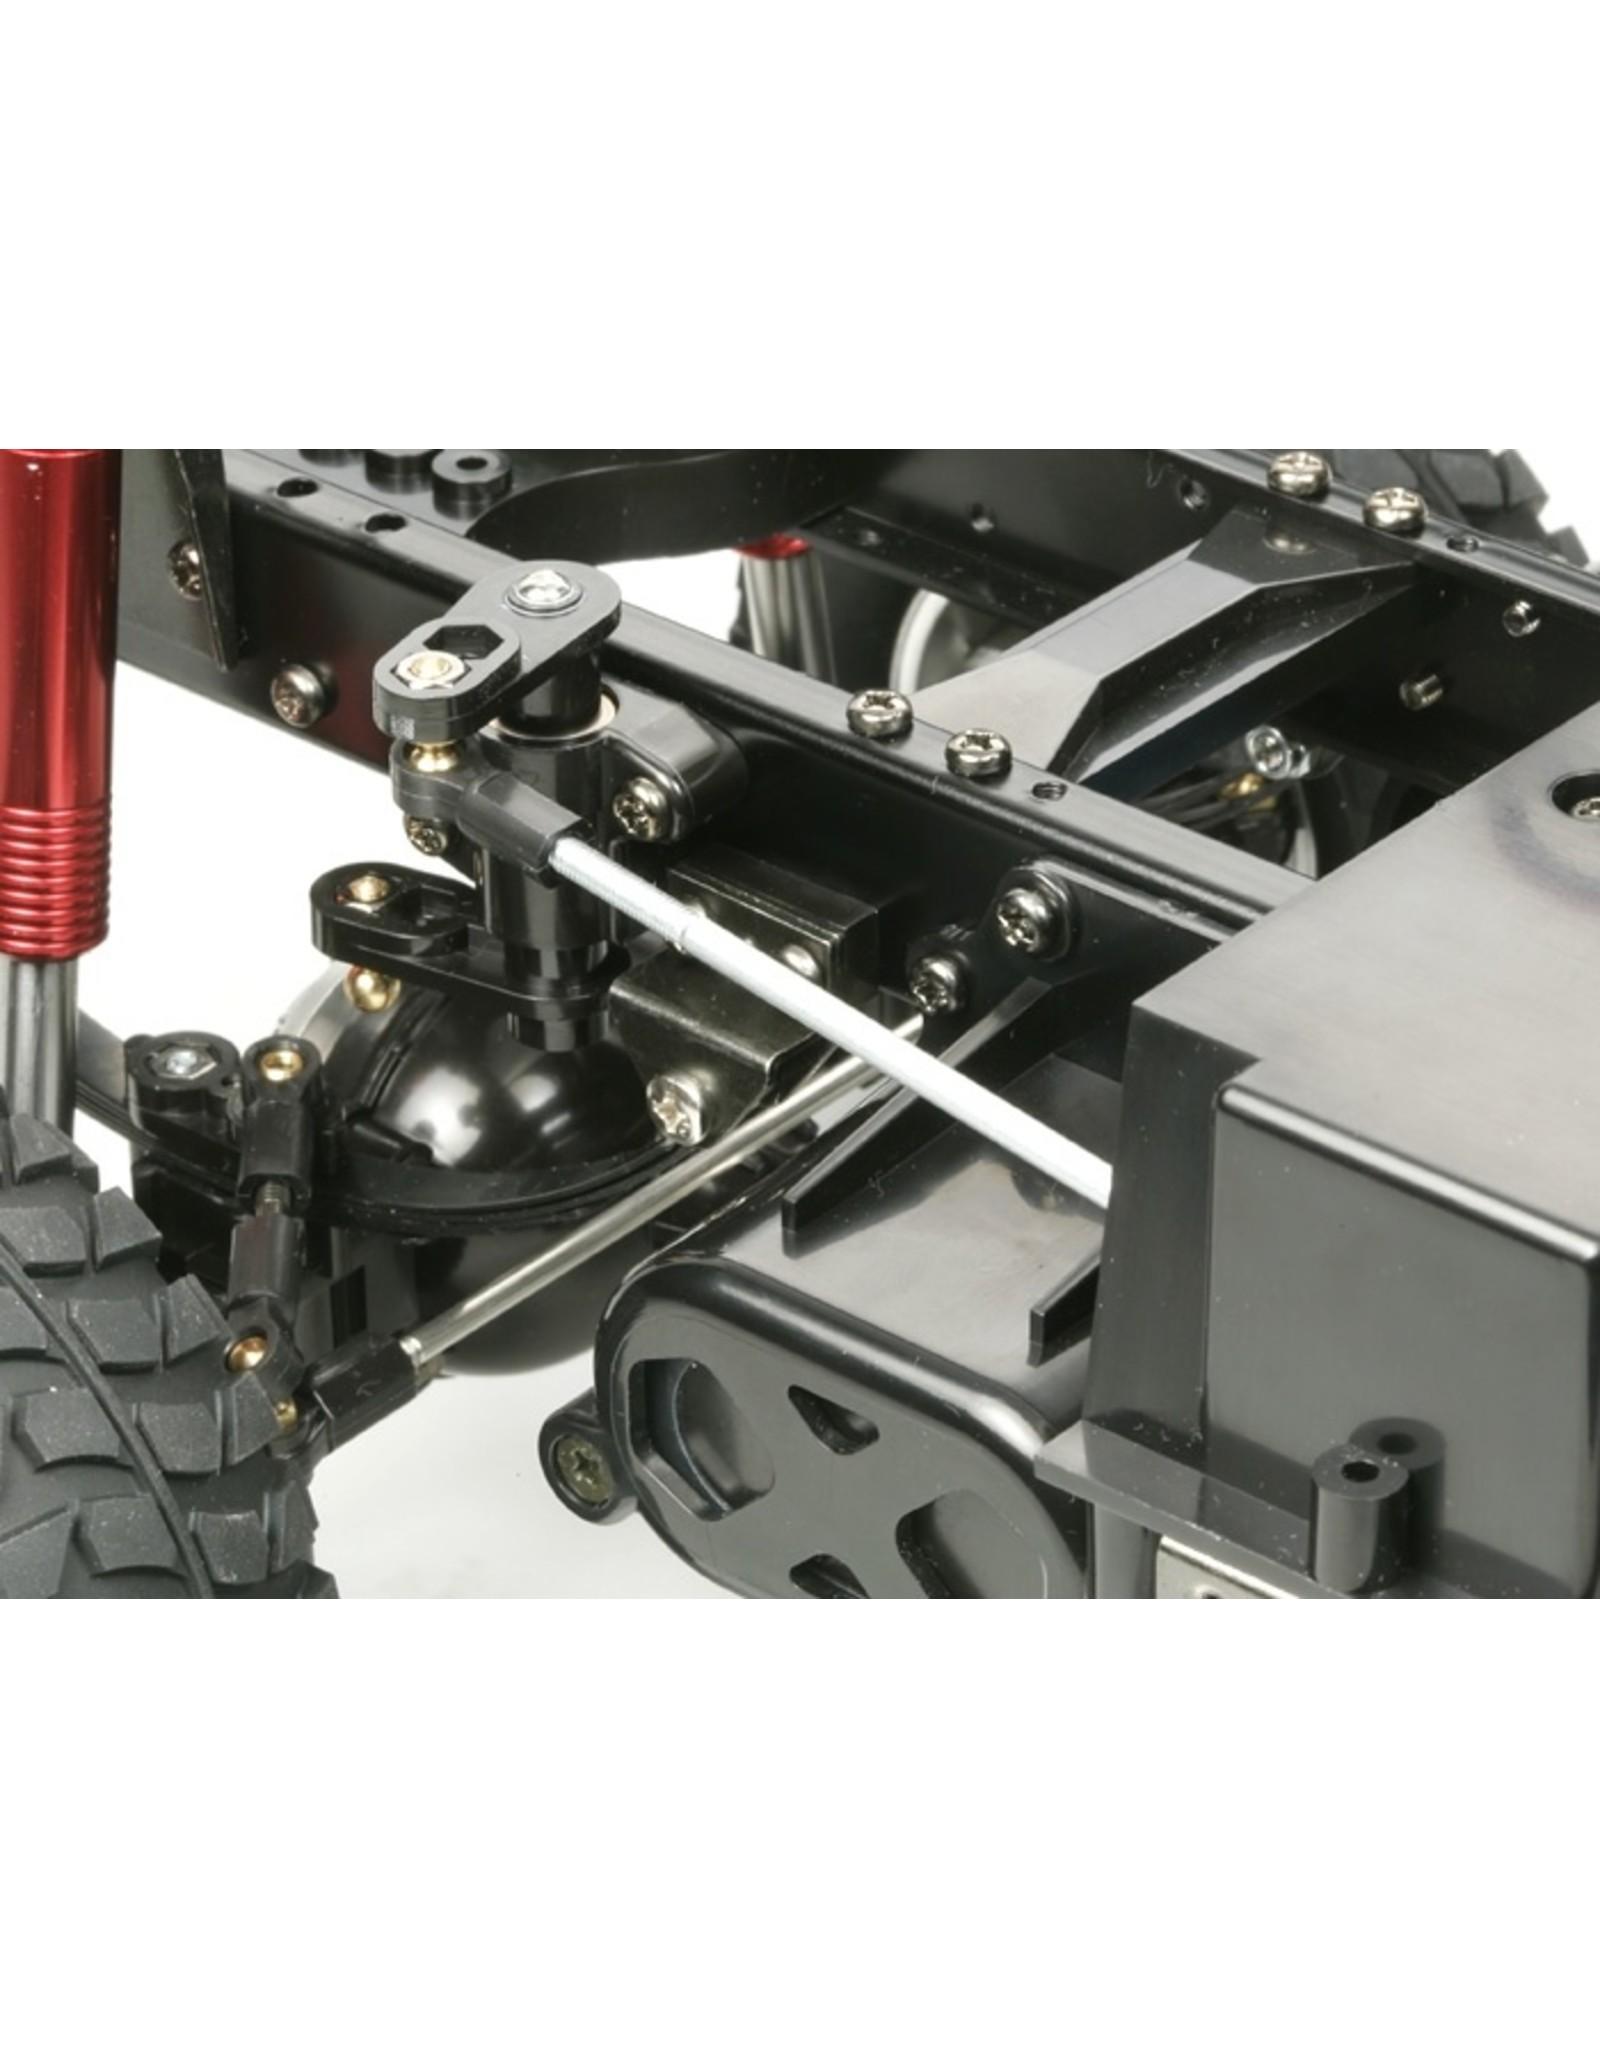 Tamiya 1/10 Ford F-350 High-Lift Kit